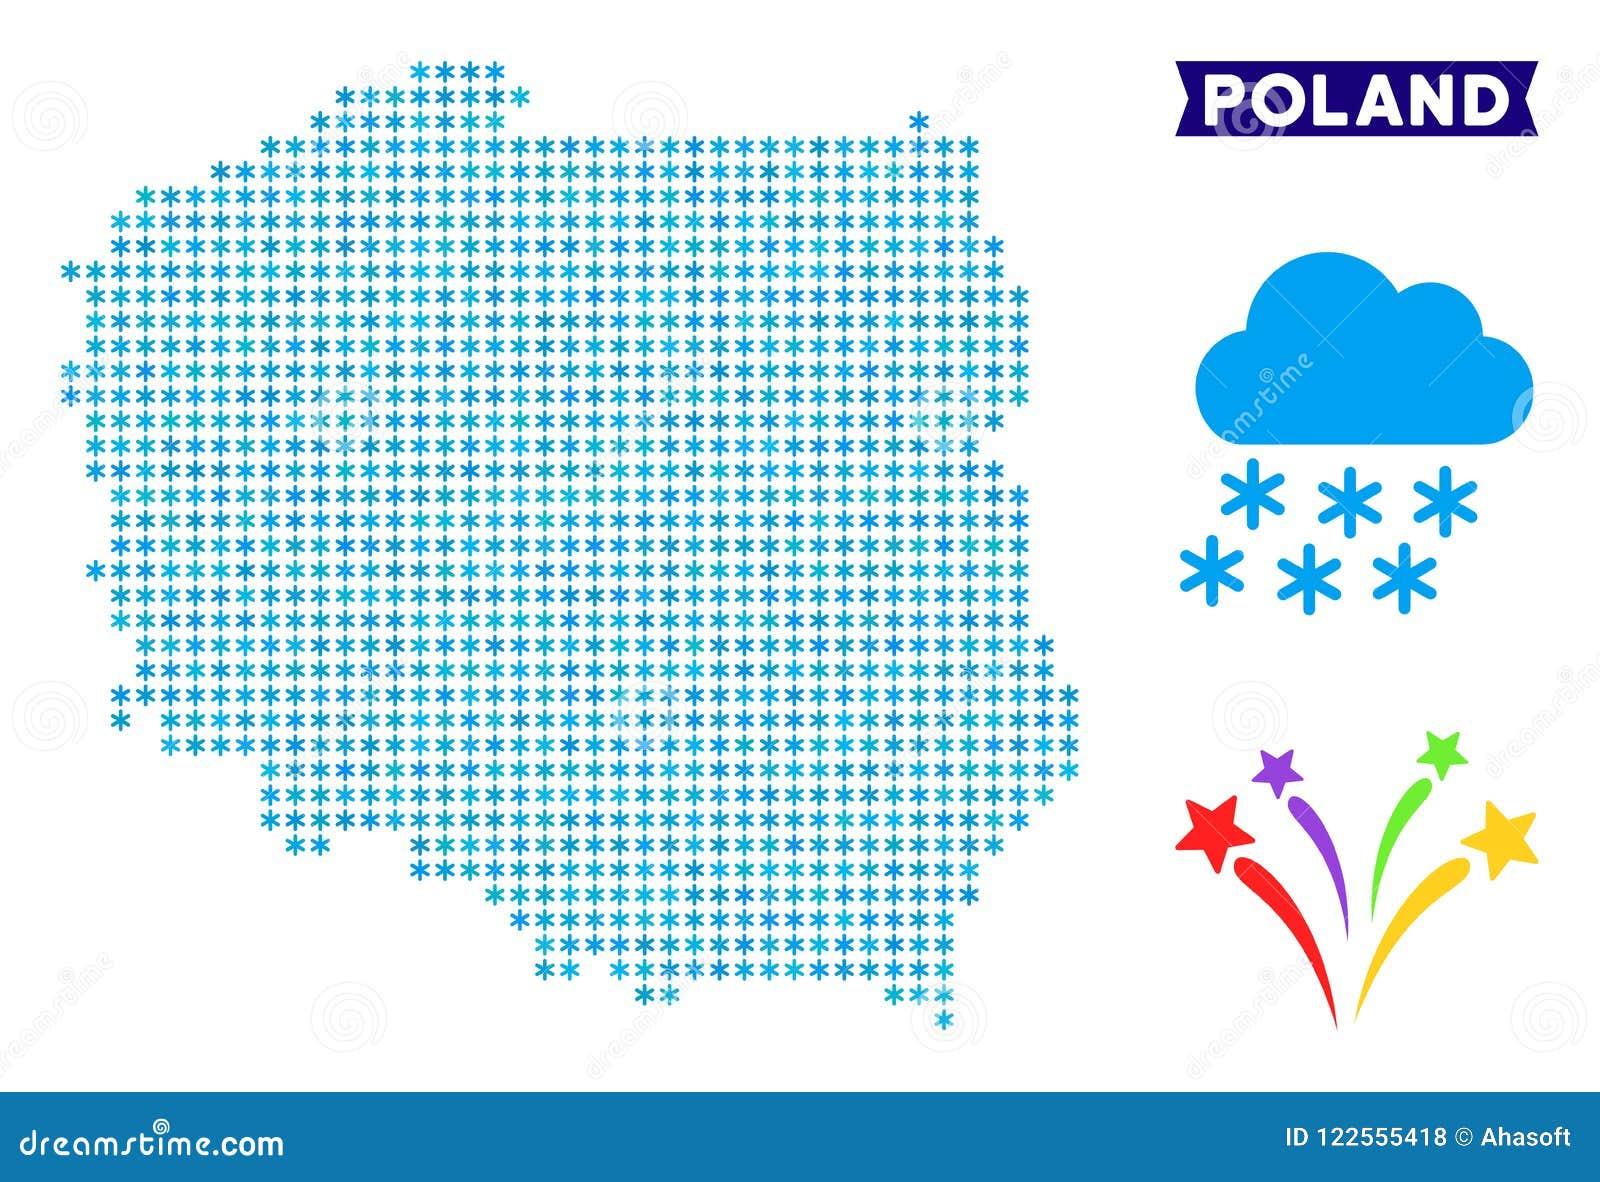 Frozen Poland Map